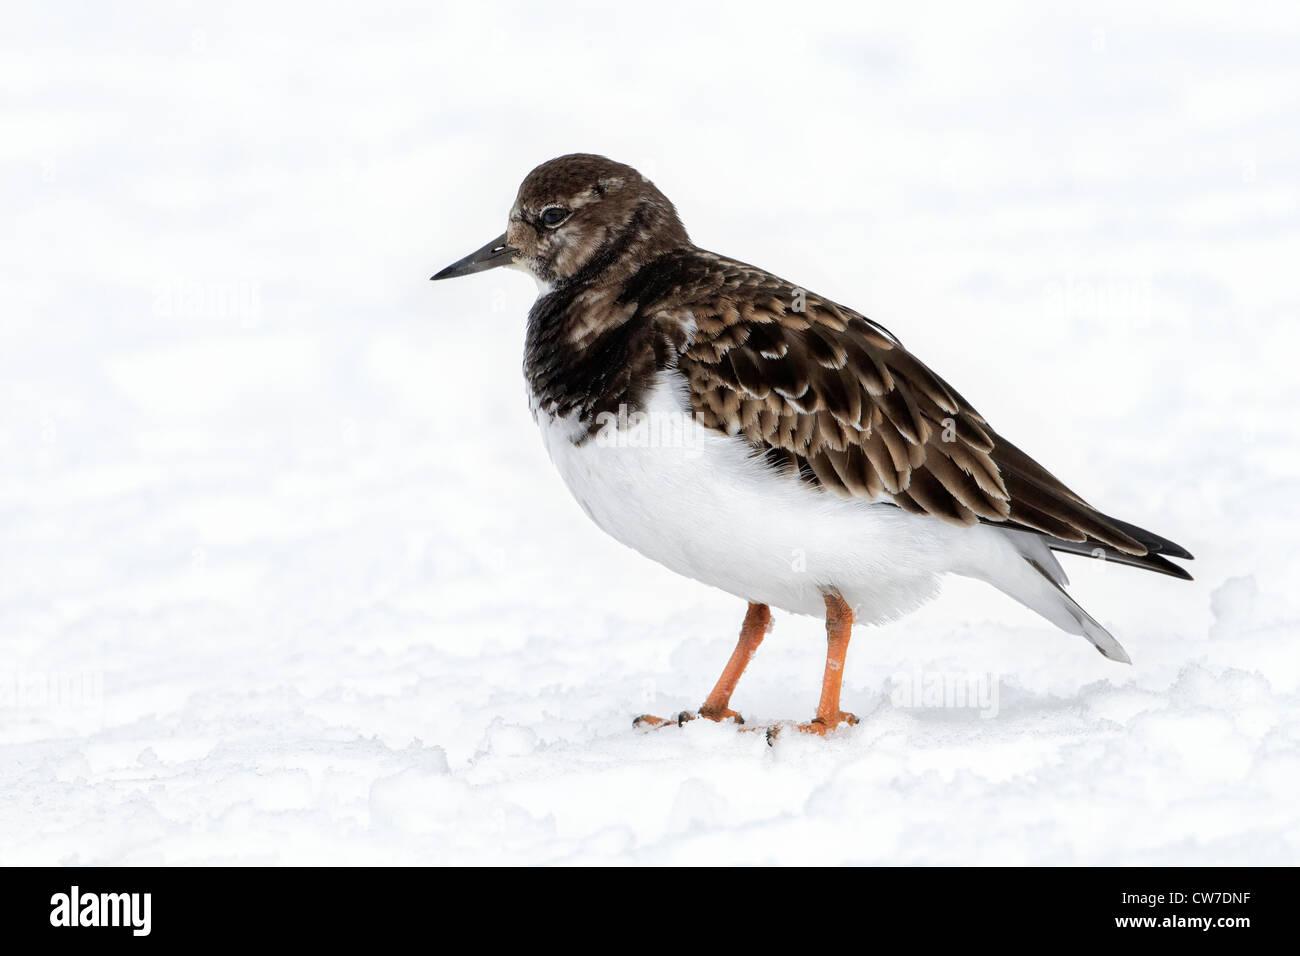 Winter plumage Turnstone - in snow - Stock Image